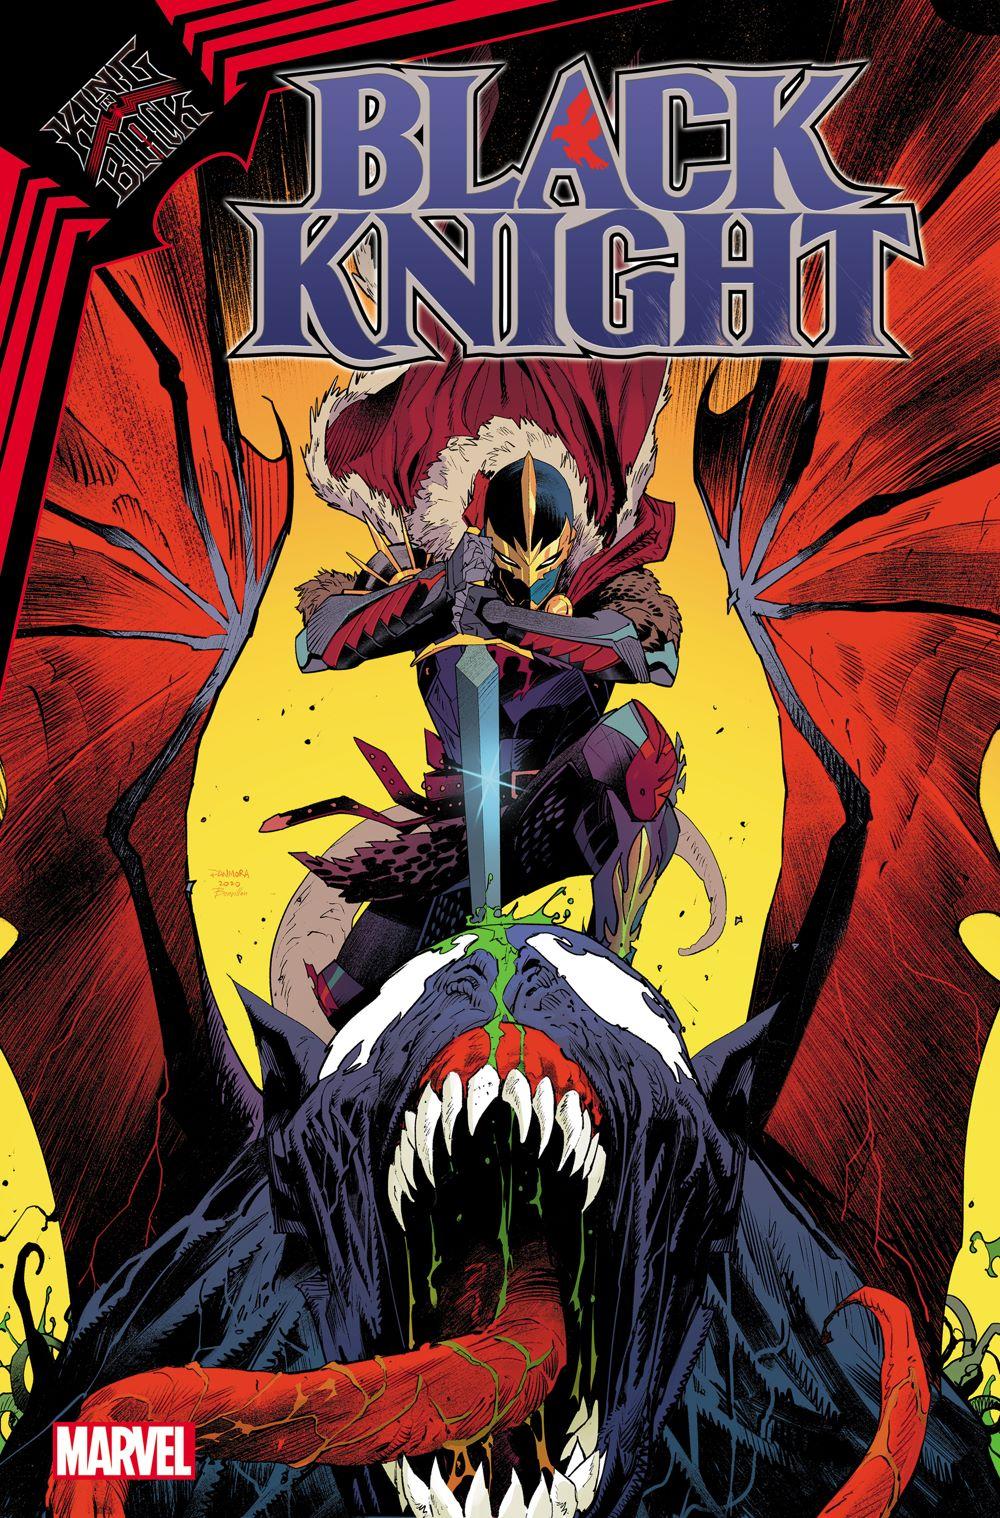 BLKKNGHTKIB2021001_cov Marvel Comics January 2021 Solicitations